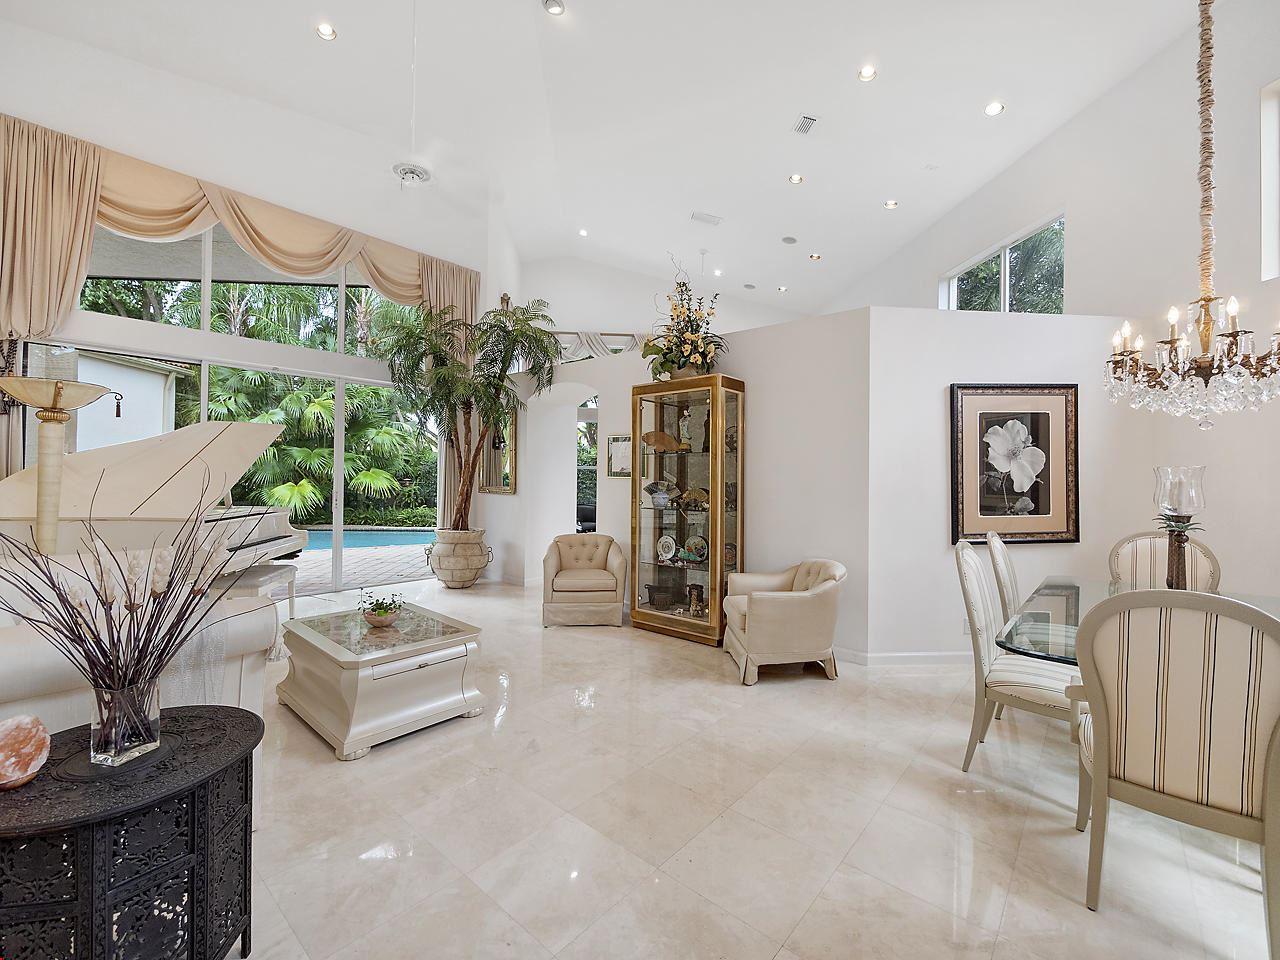 Photo of 128 Sunset Cove Lane, Palm Beach Gardens, FL 33418 (MLS # RX-10667328)